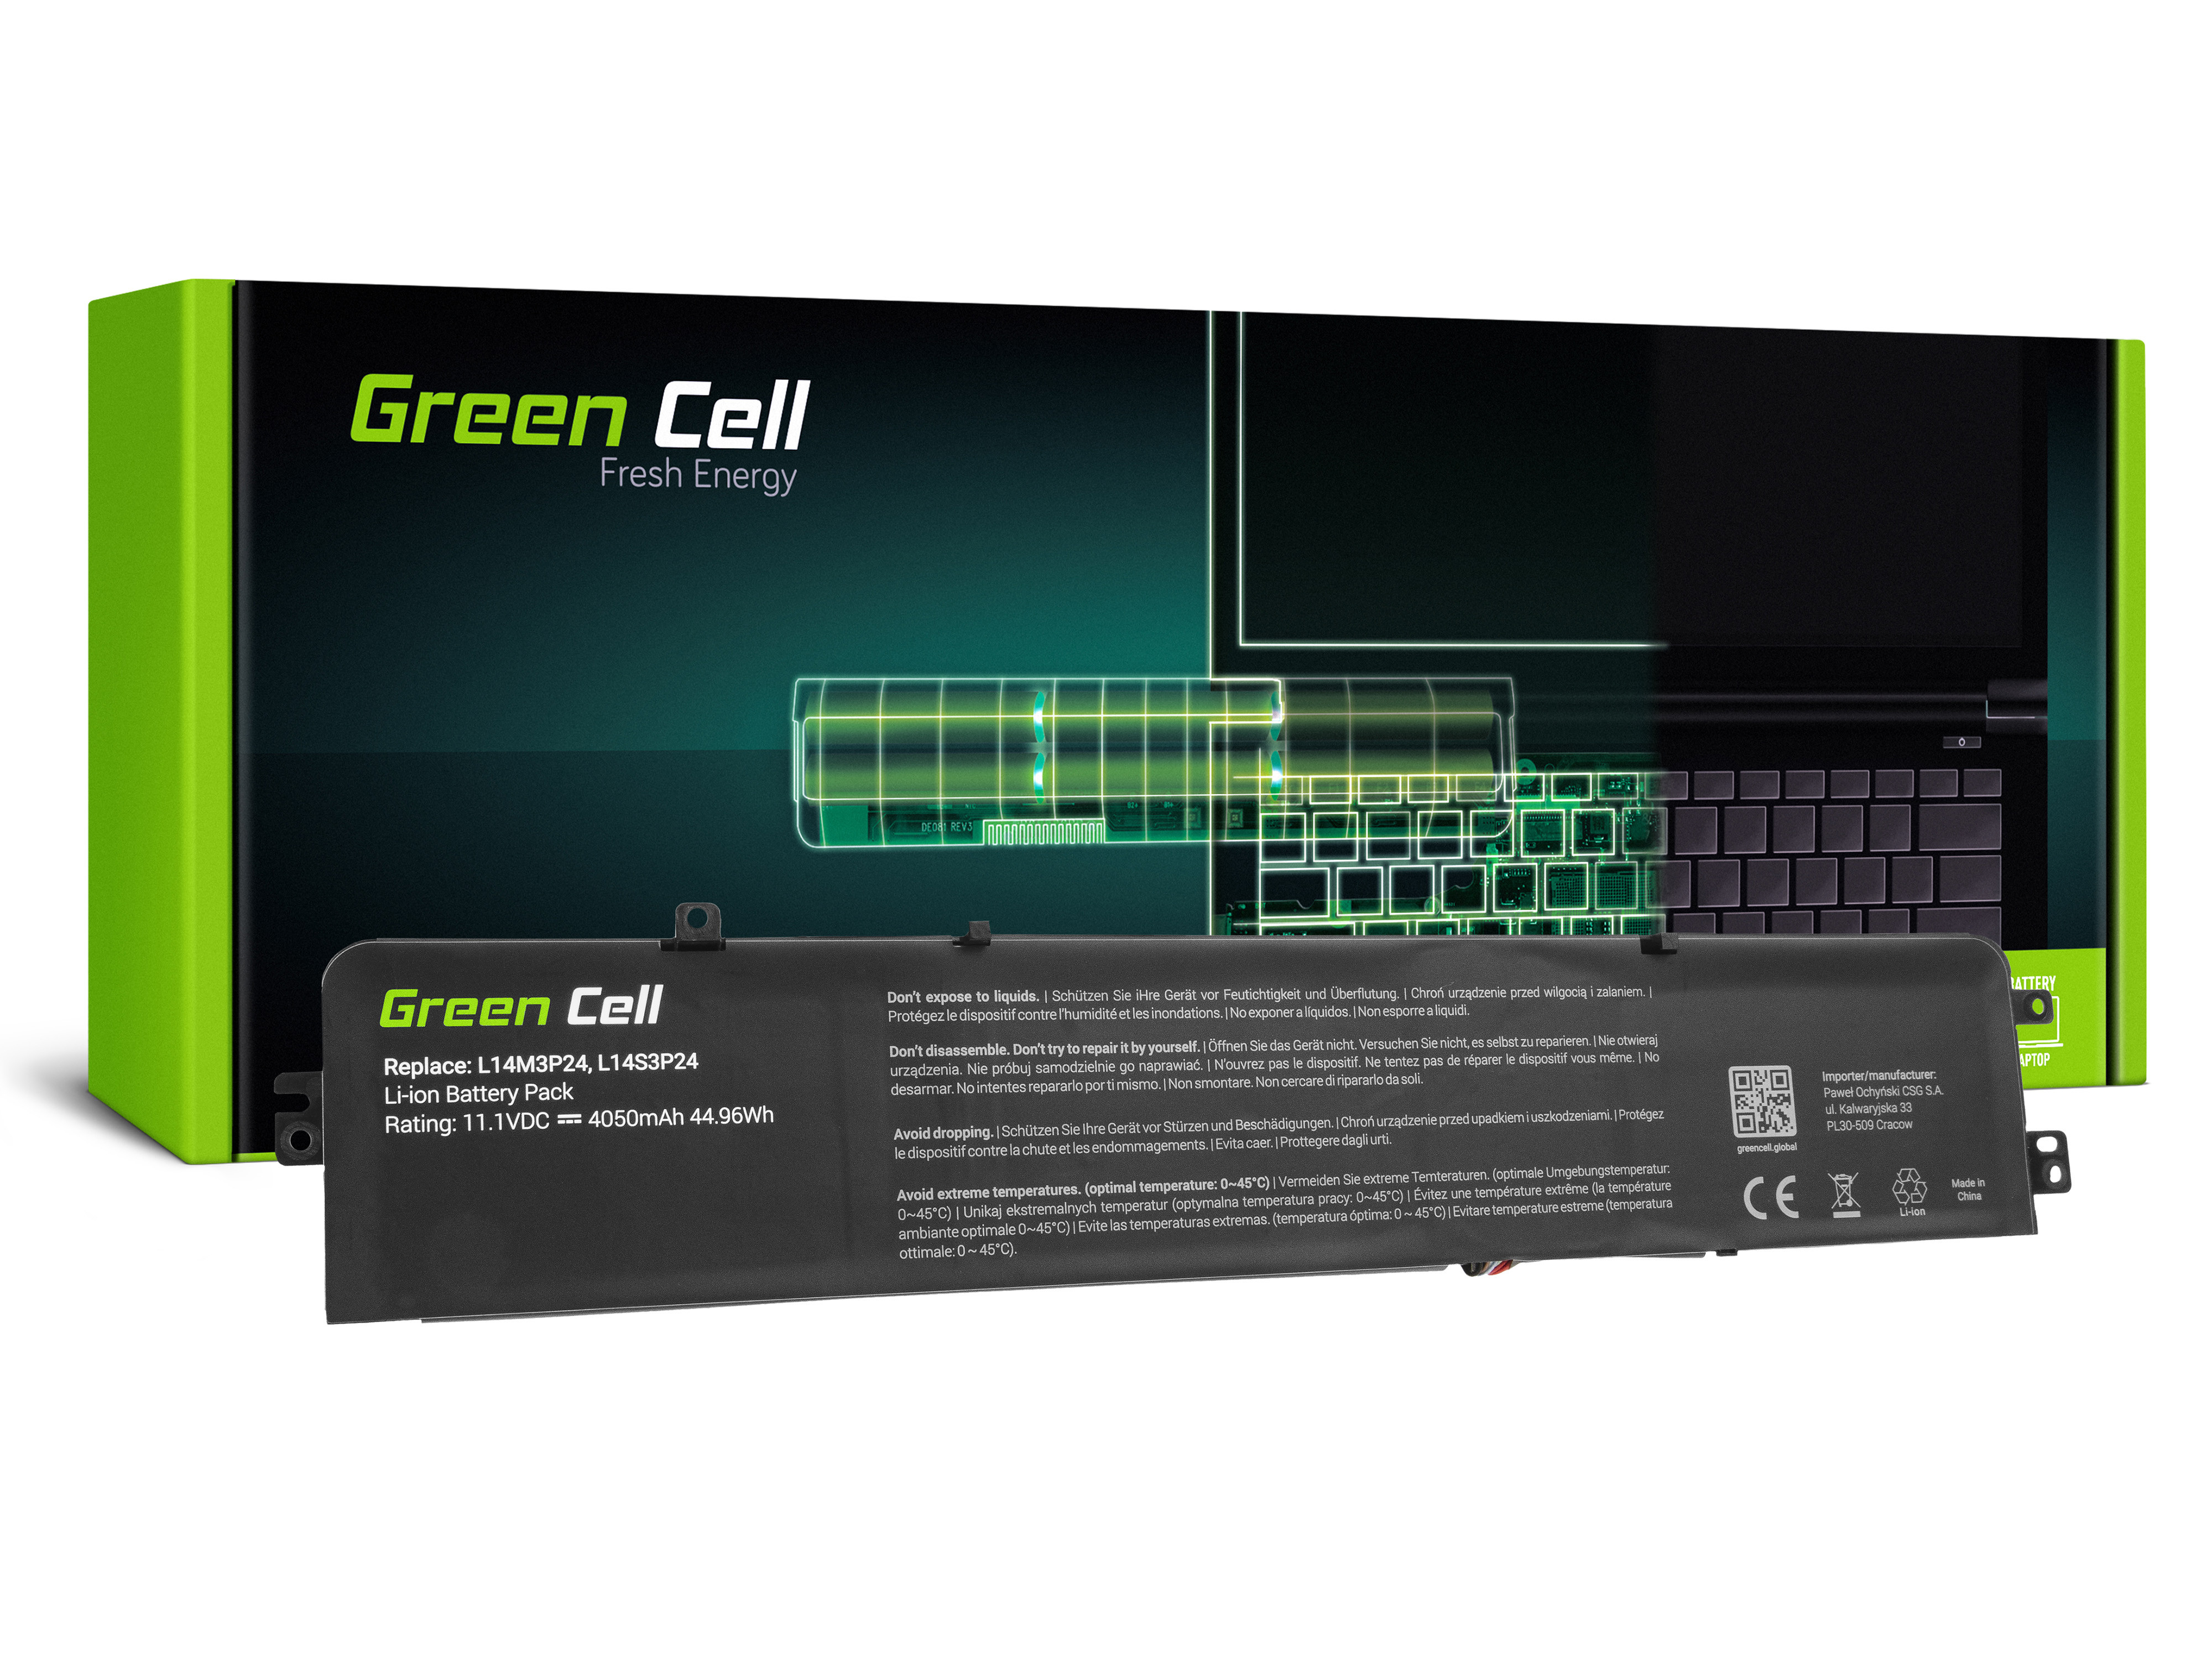 Green Cell LE102 Baterie IBM L14M3P24 L14S3P24 Lenovo 700-15ISK 700-17ISK Y700-14ISK Legion R720 Y520 4050mAh Li-Pol – neoriginální